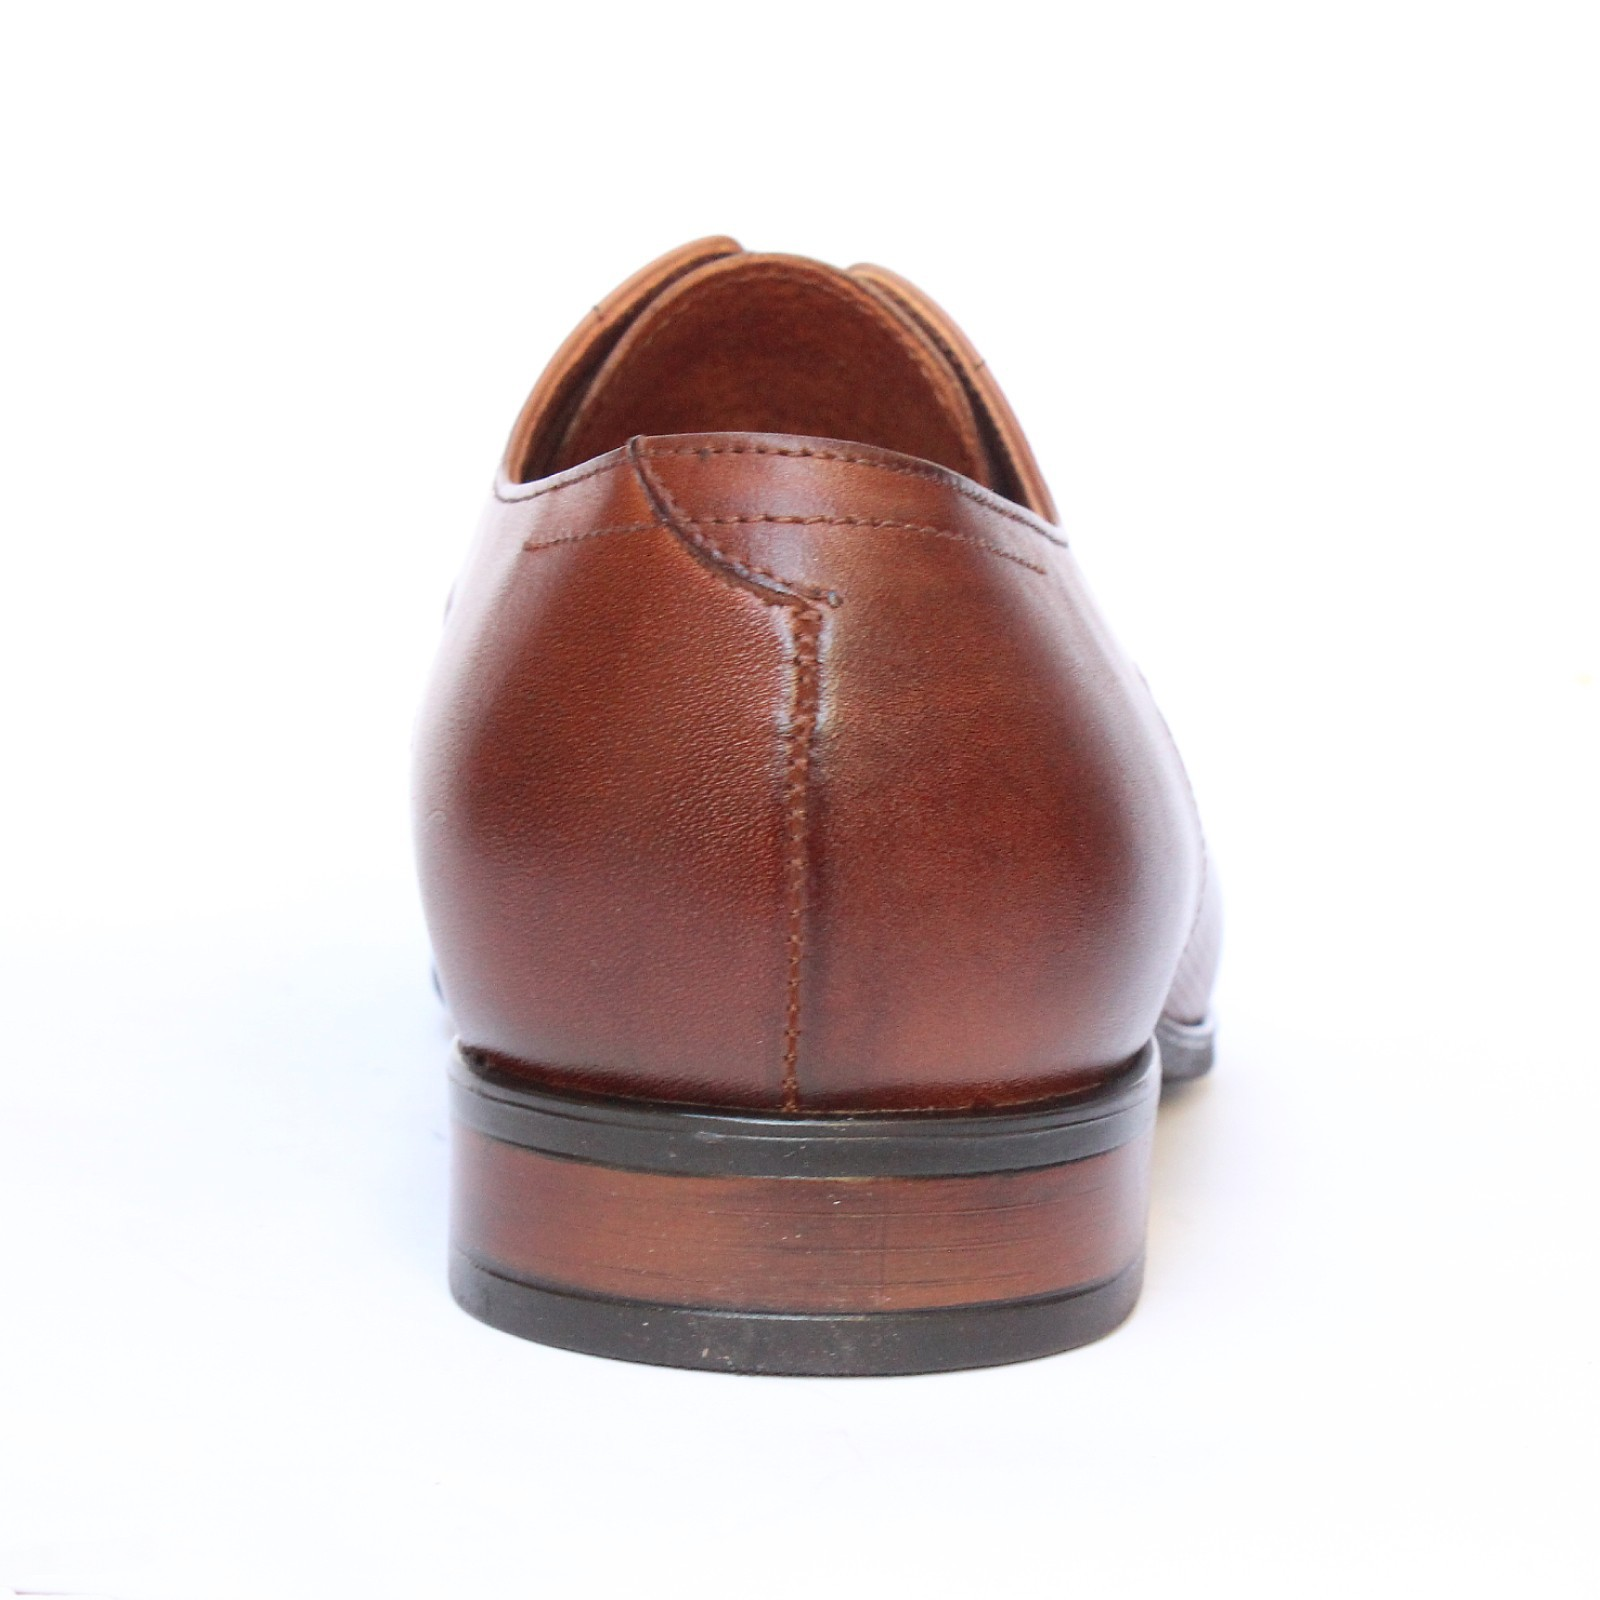 04328 Lavaggio elegáns férfi félcipő 301 3 Férfi elegáns